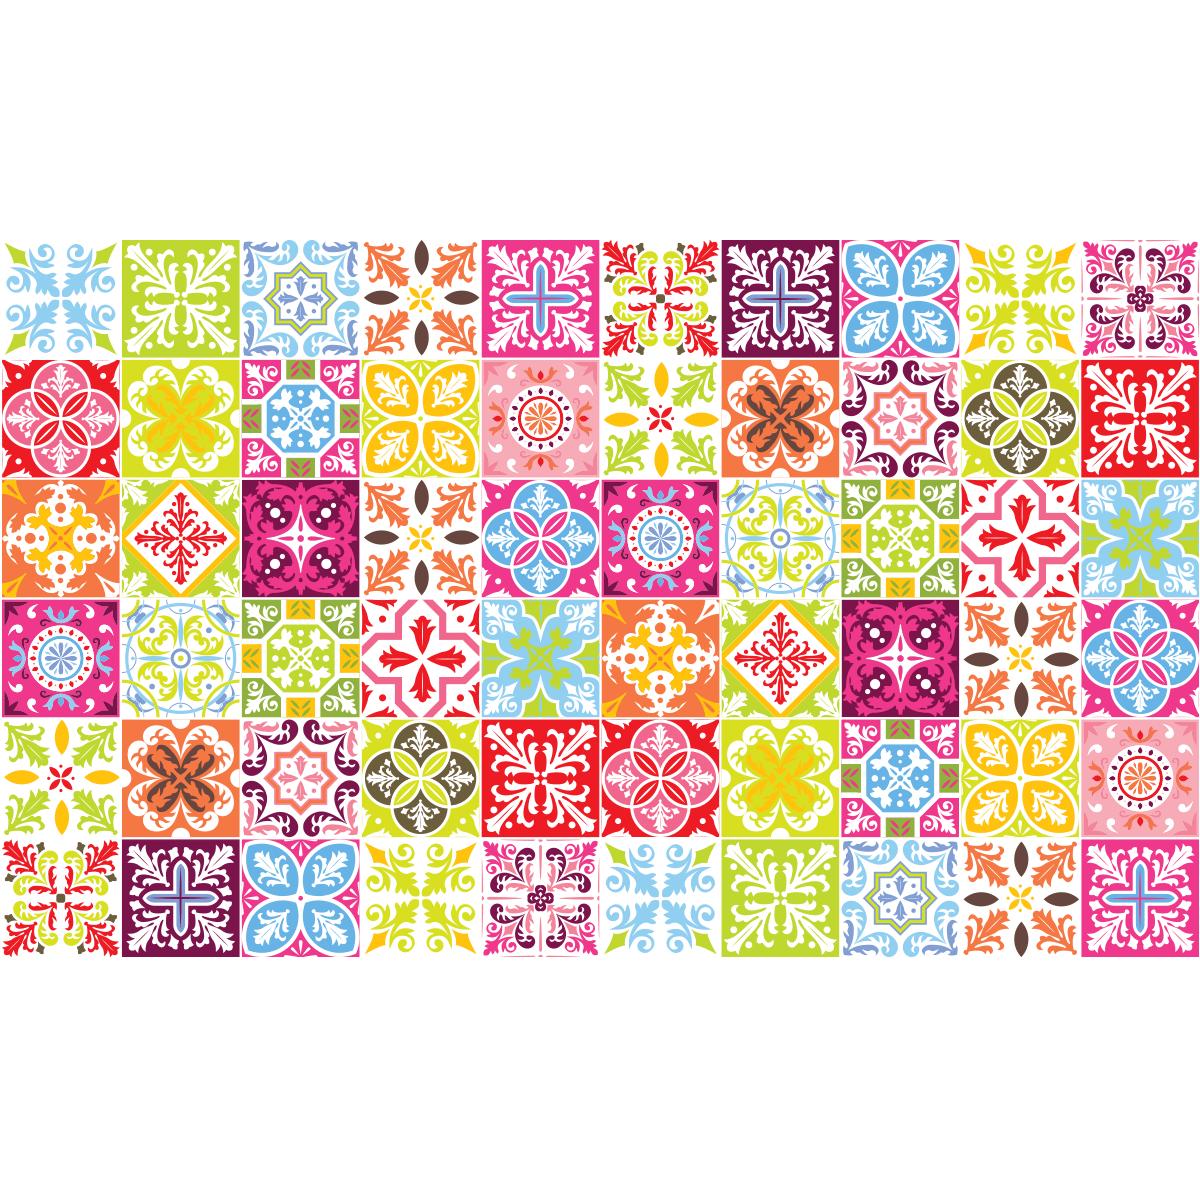 60 stickers carrelages azulejos vintage arabesques art et design artistiques ambiance sticker. Black Bedroom Furniture Sets. Home Design Ideas